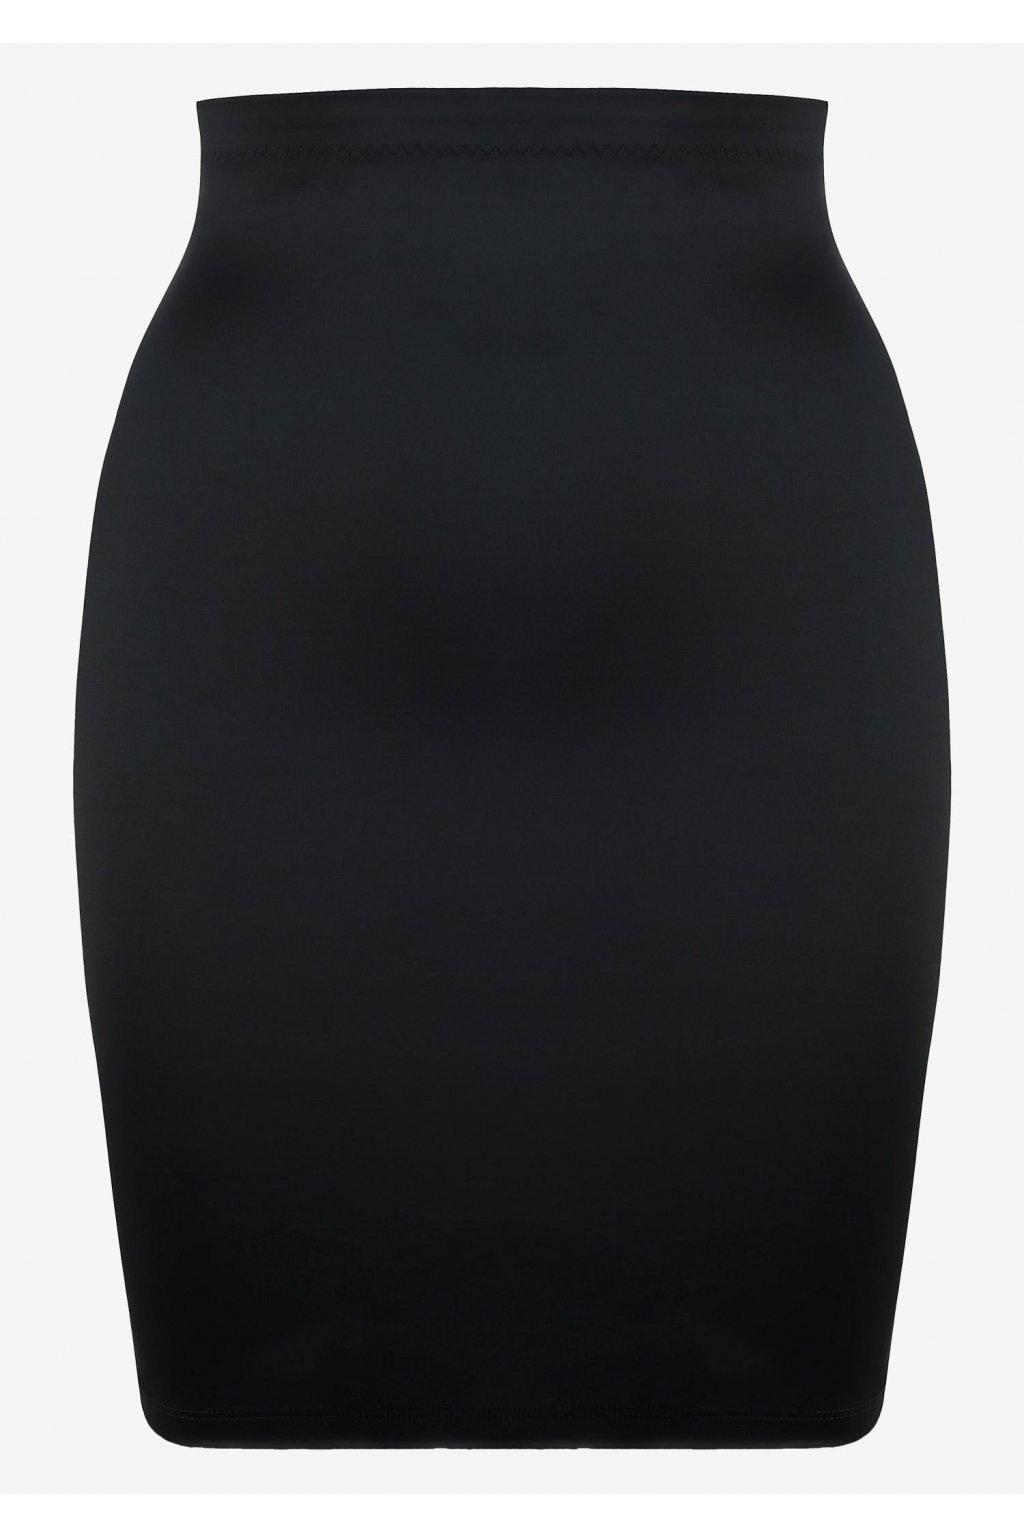 poupee wygladzajaca polhalka perfect figure 7